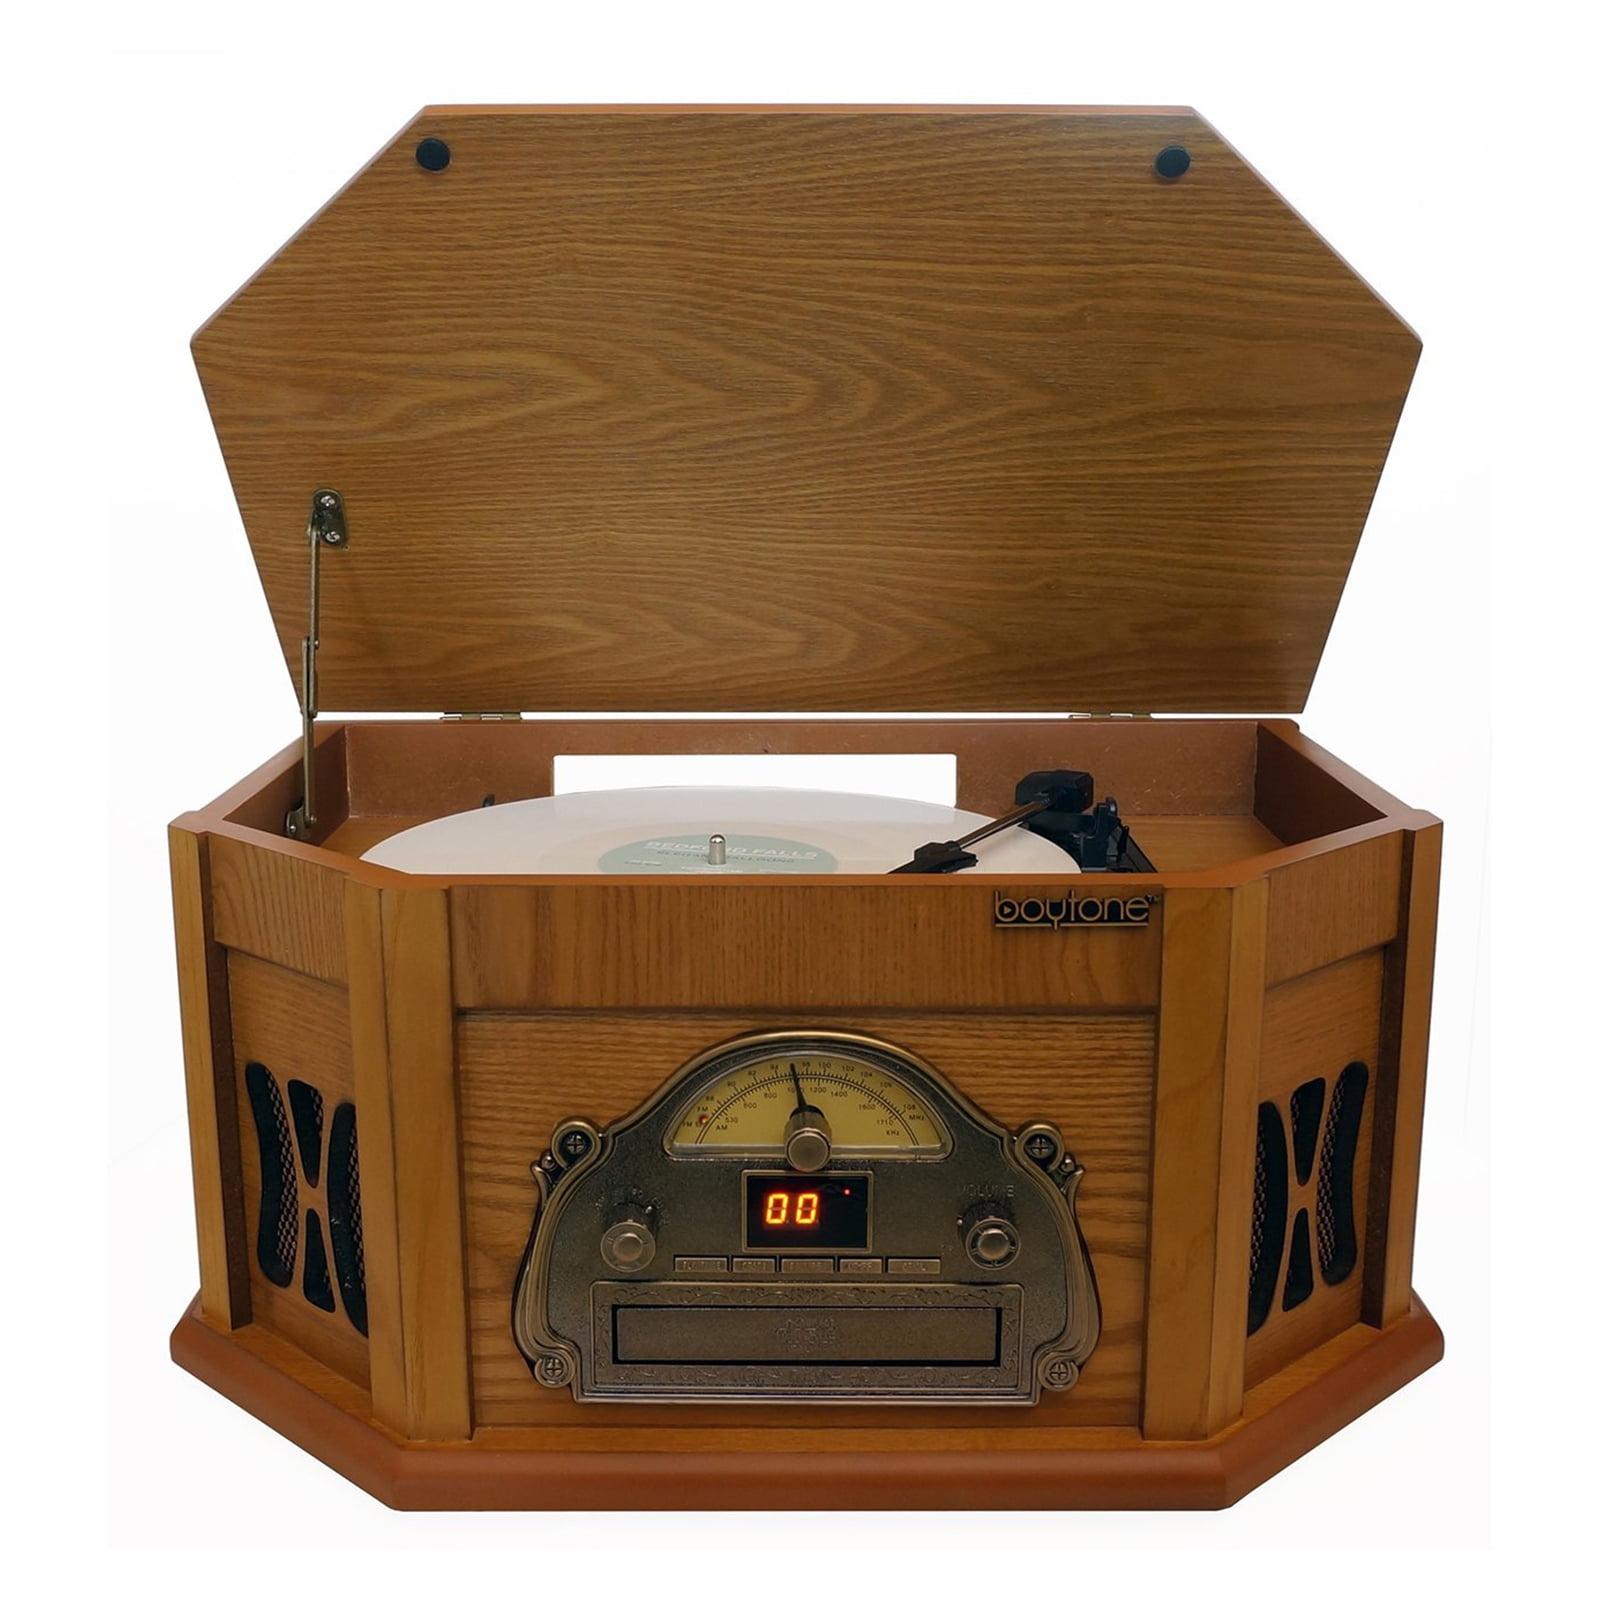 Boytone 3-Speed Stereo Turntable with AM-FM Radio, Wood by Boytone